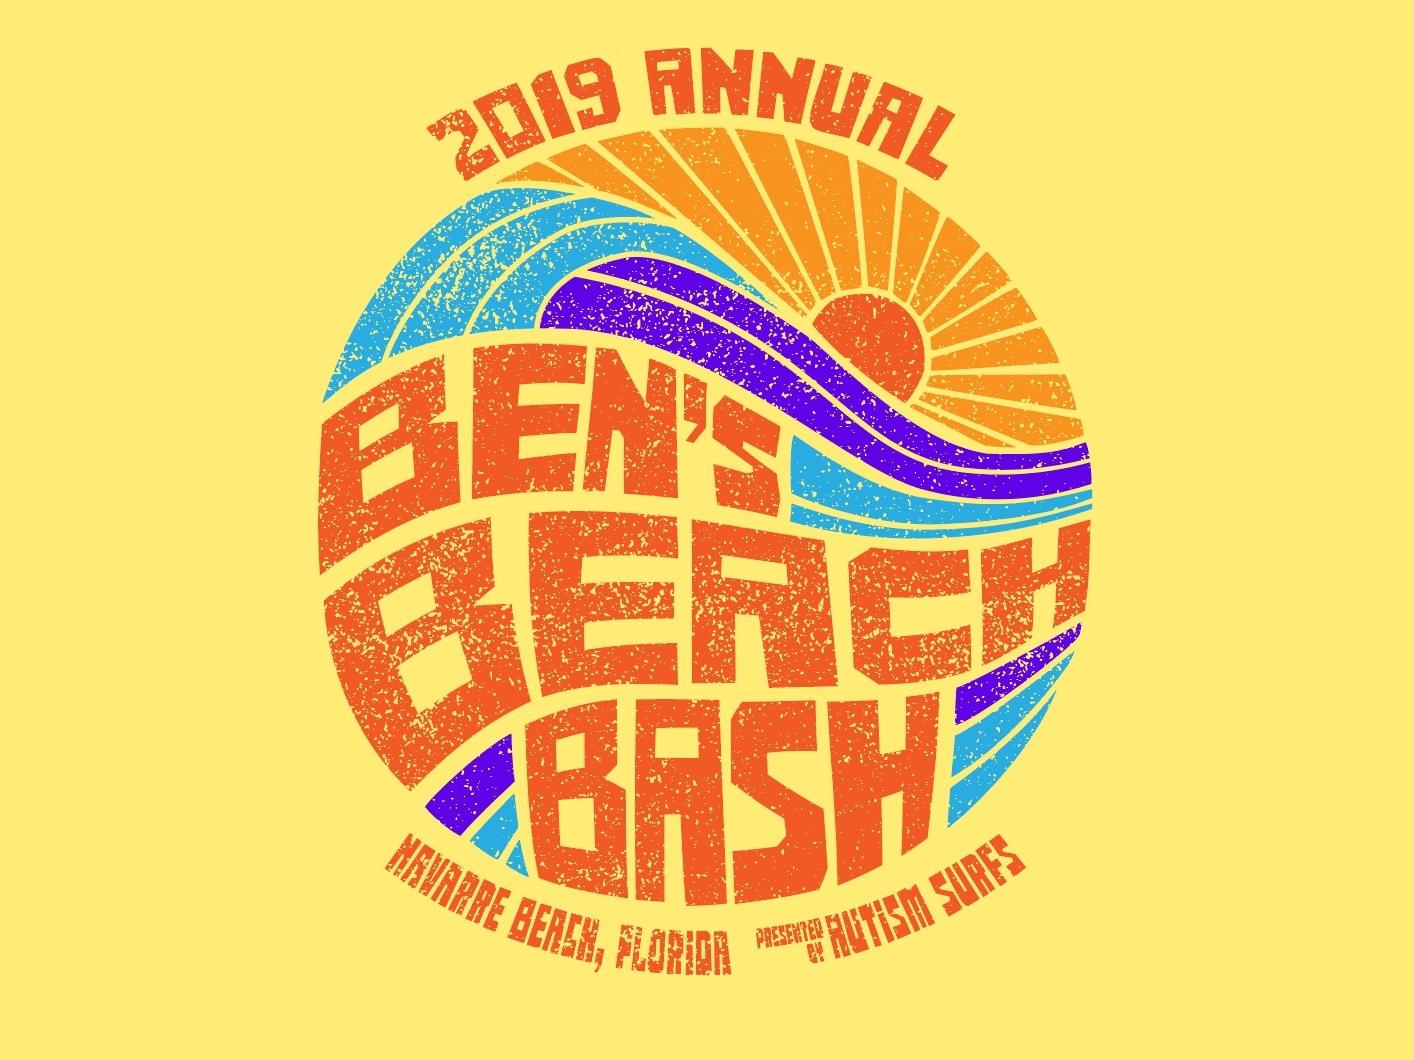 Ben's Beach Bash - Event T florida navarre wave sunset beach surfing autism